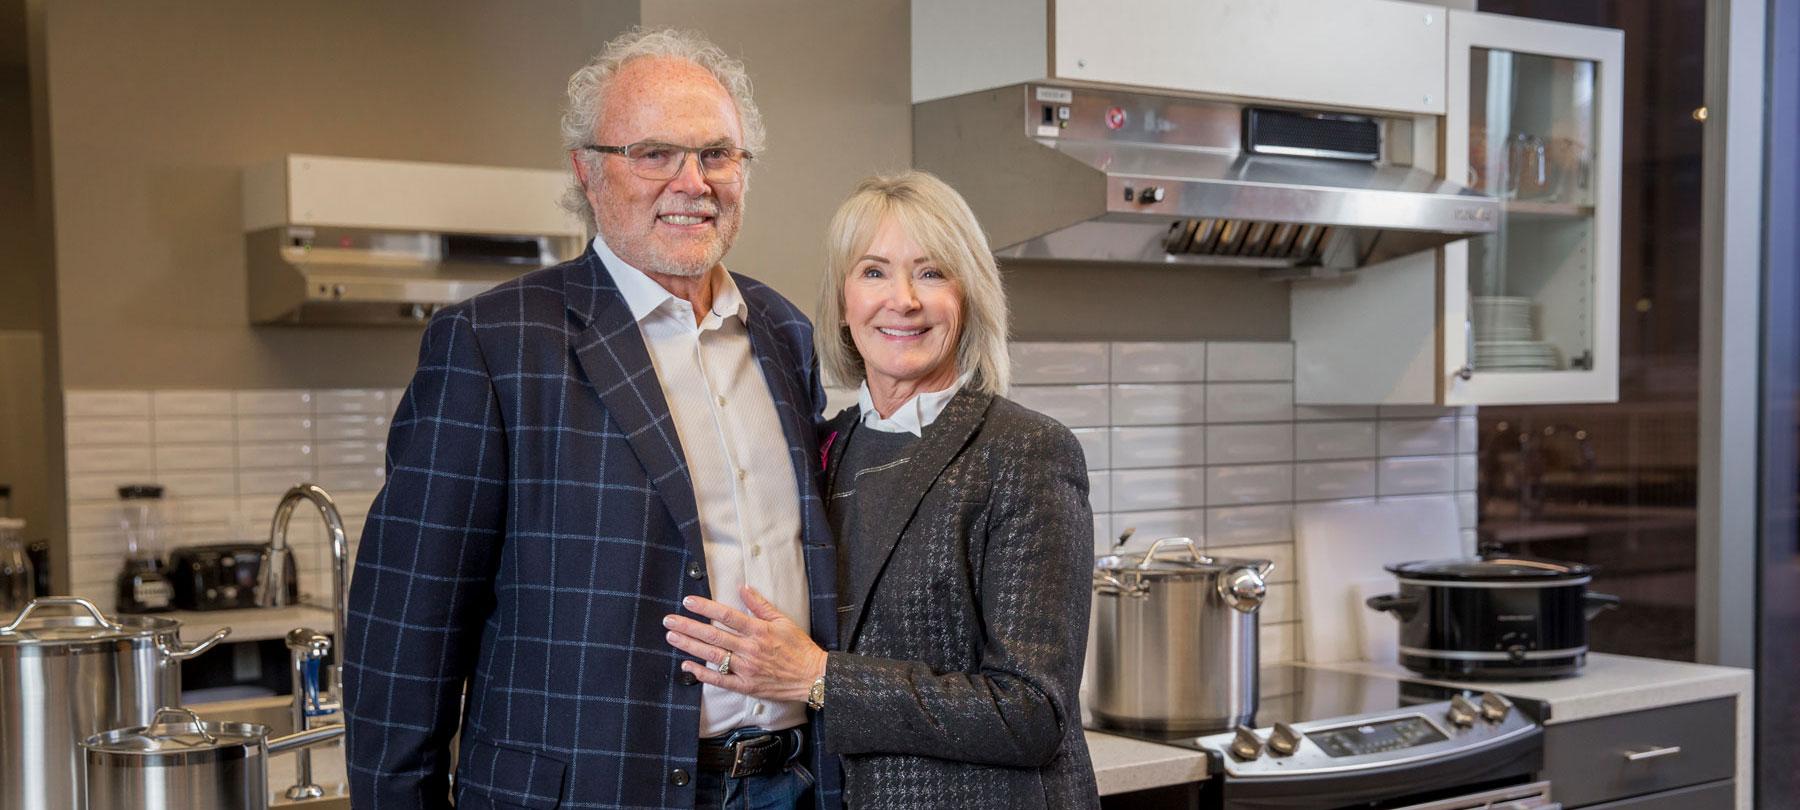 Gary and Christine Rood